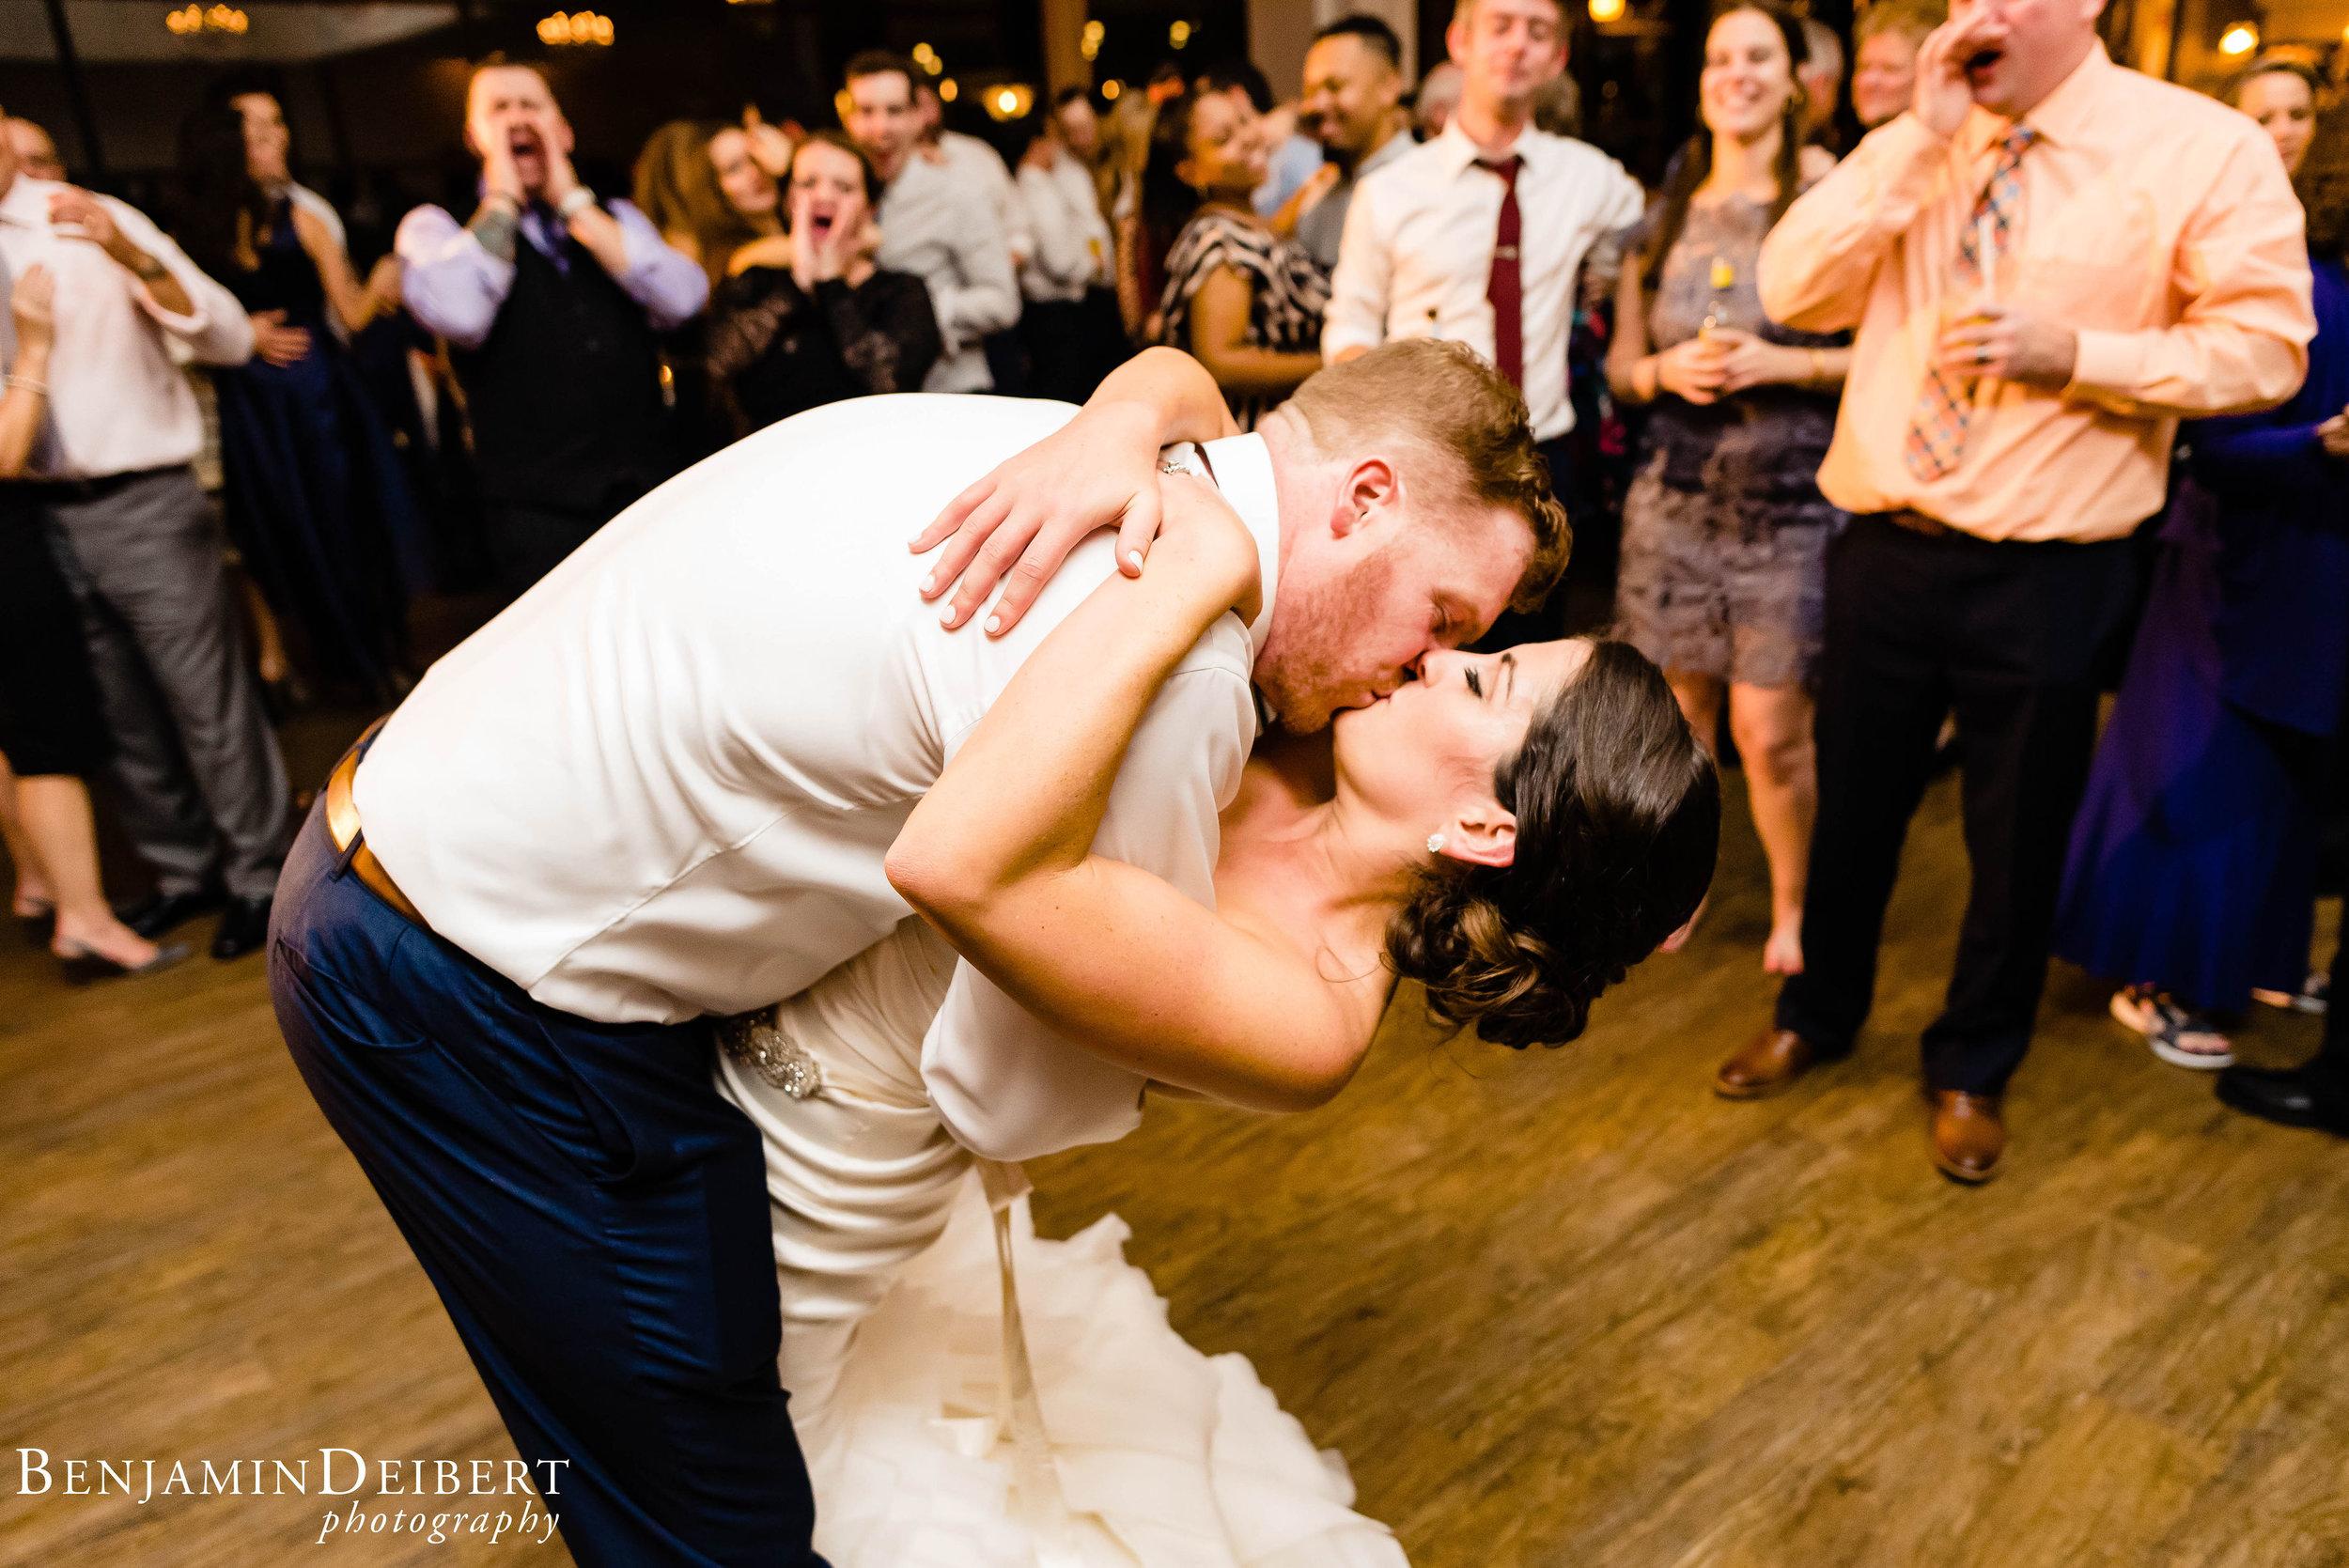 TeghanandChris_BridgemensBallroom_Wedding-144.jpg